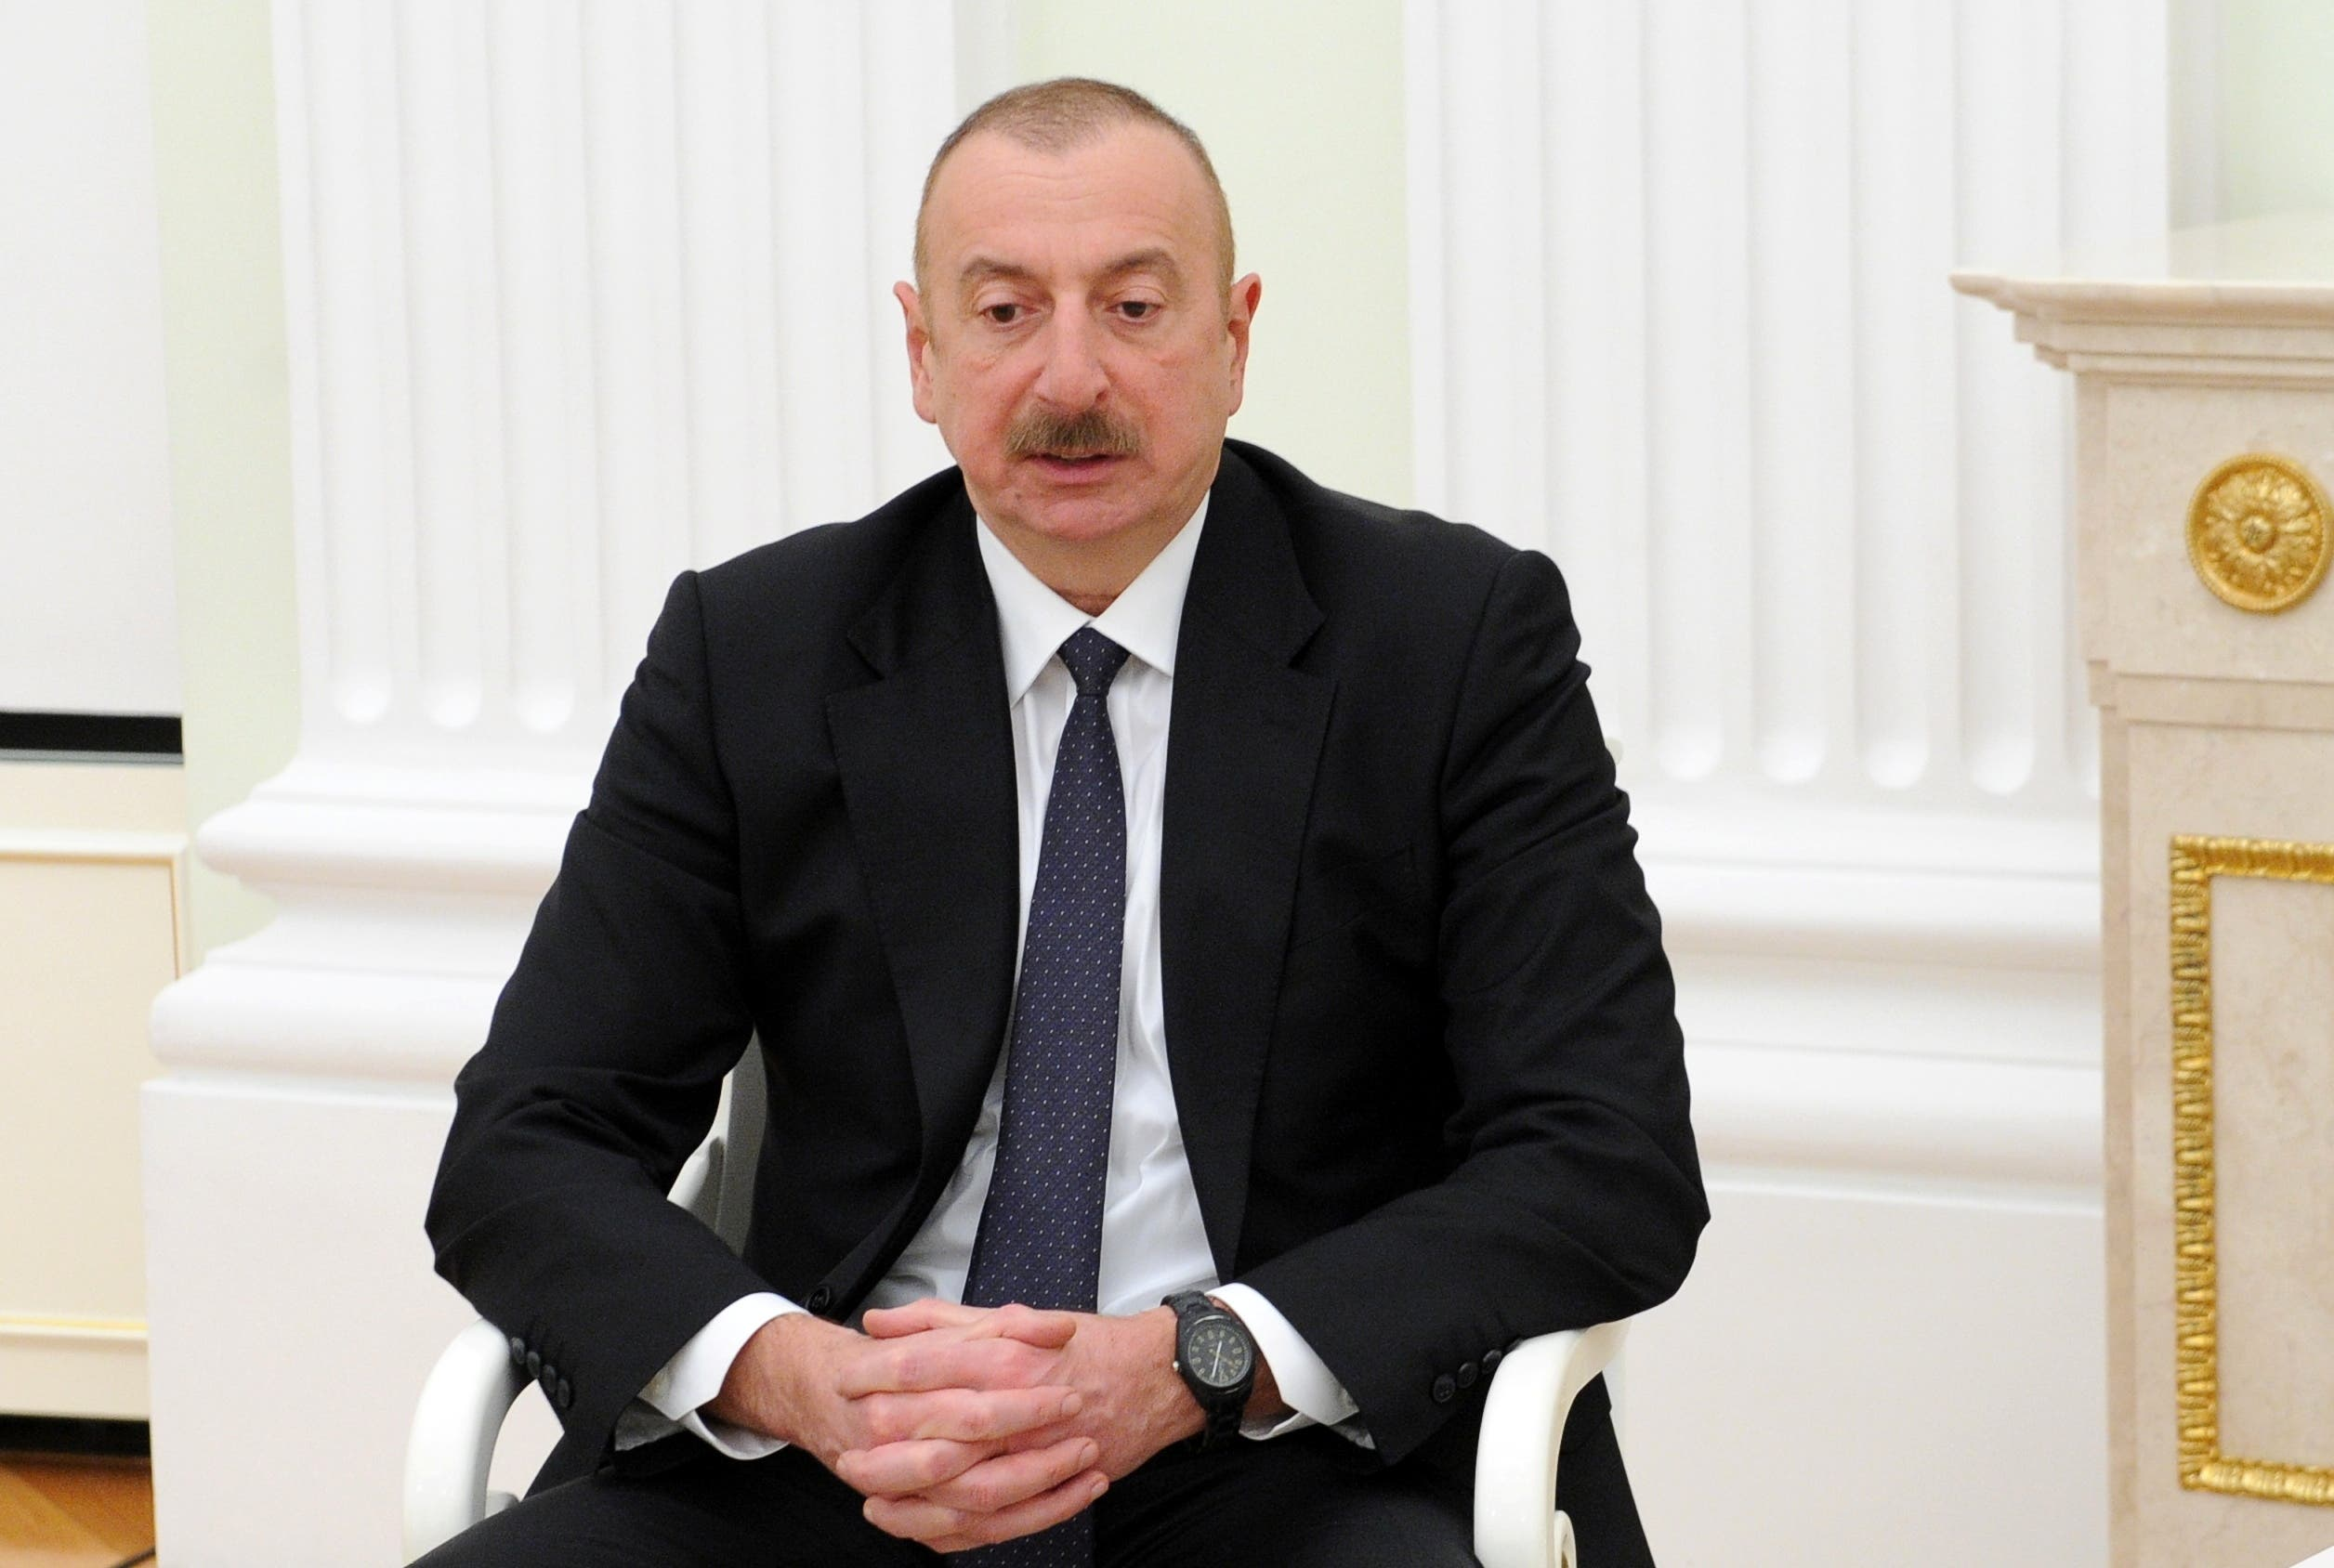 Azerbaijan's President Ilham Aliyev. (File photo: Reuters)